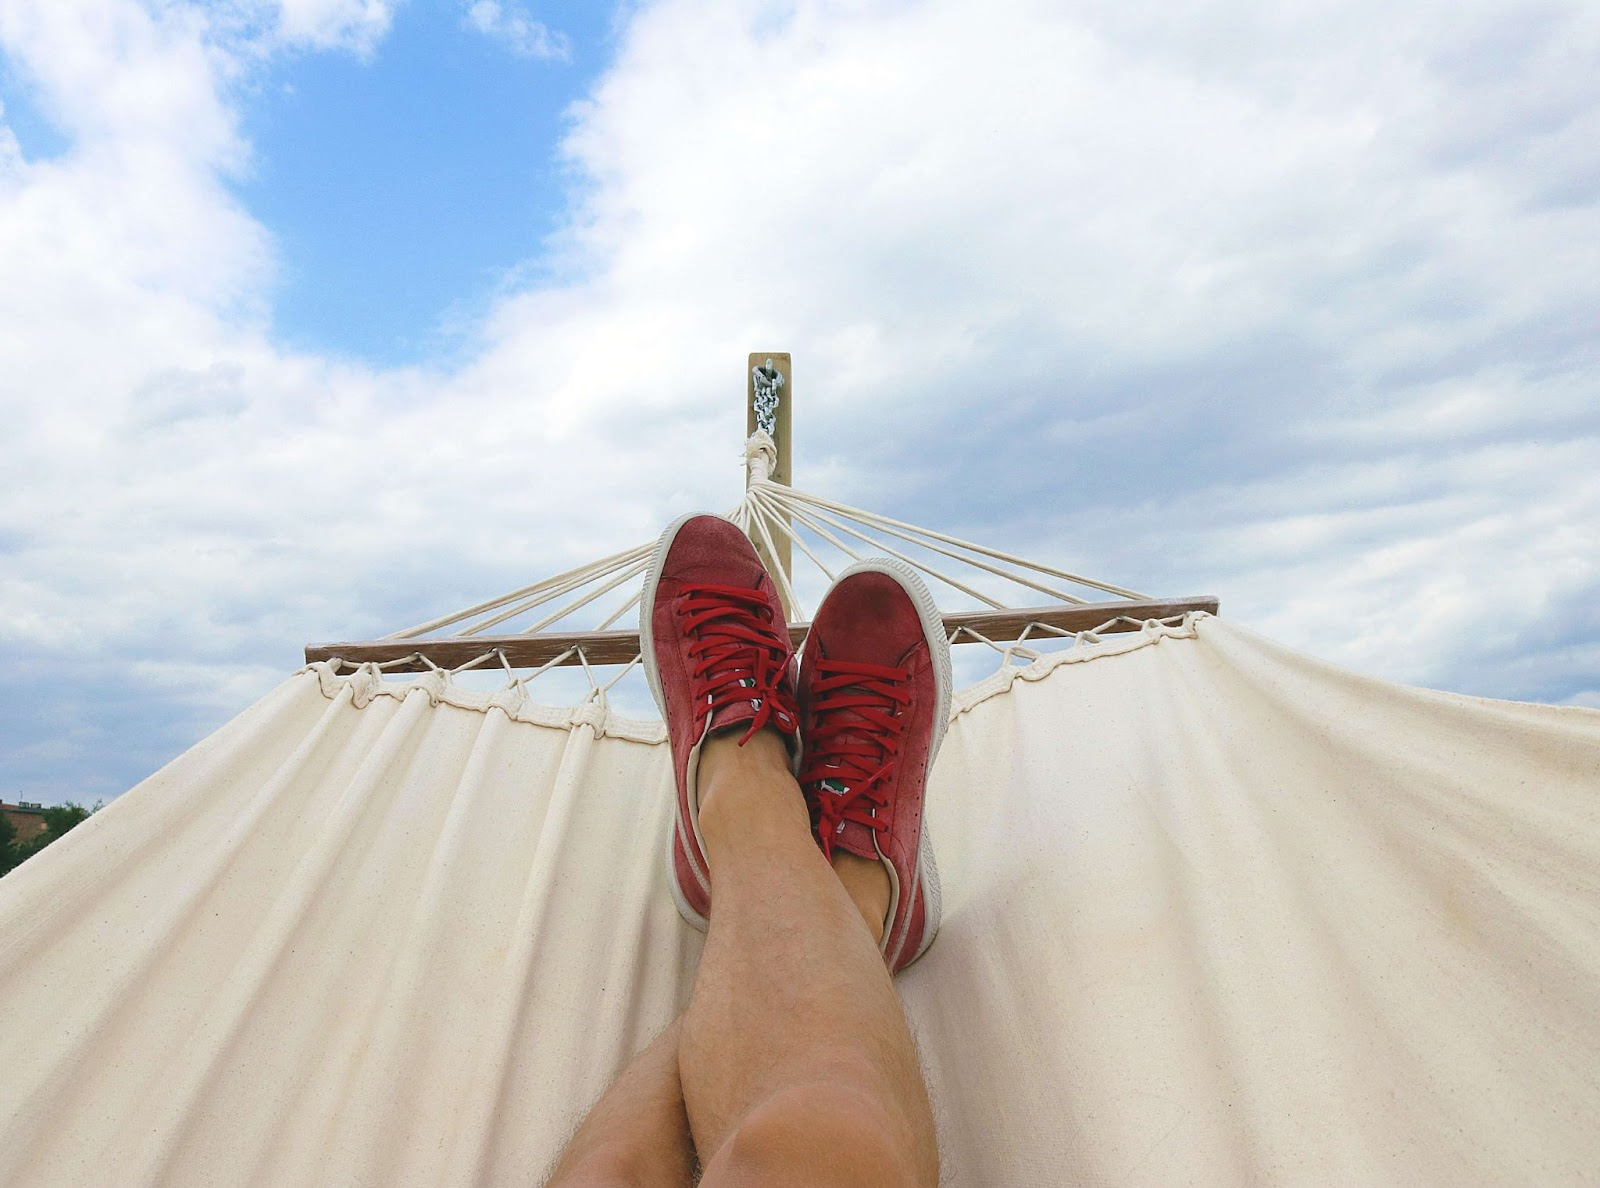 A person's feet in a hammock